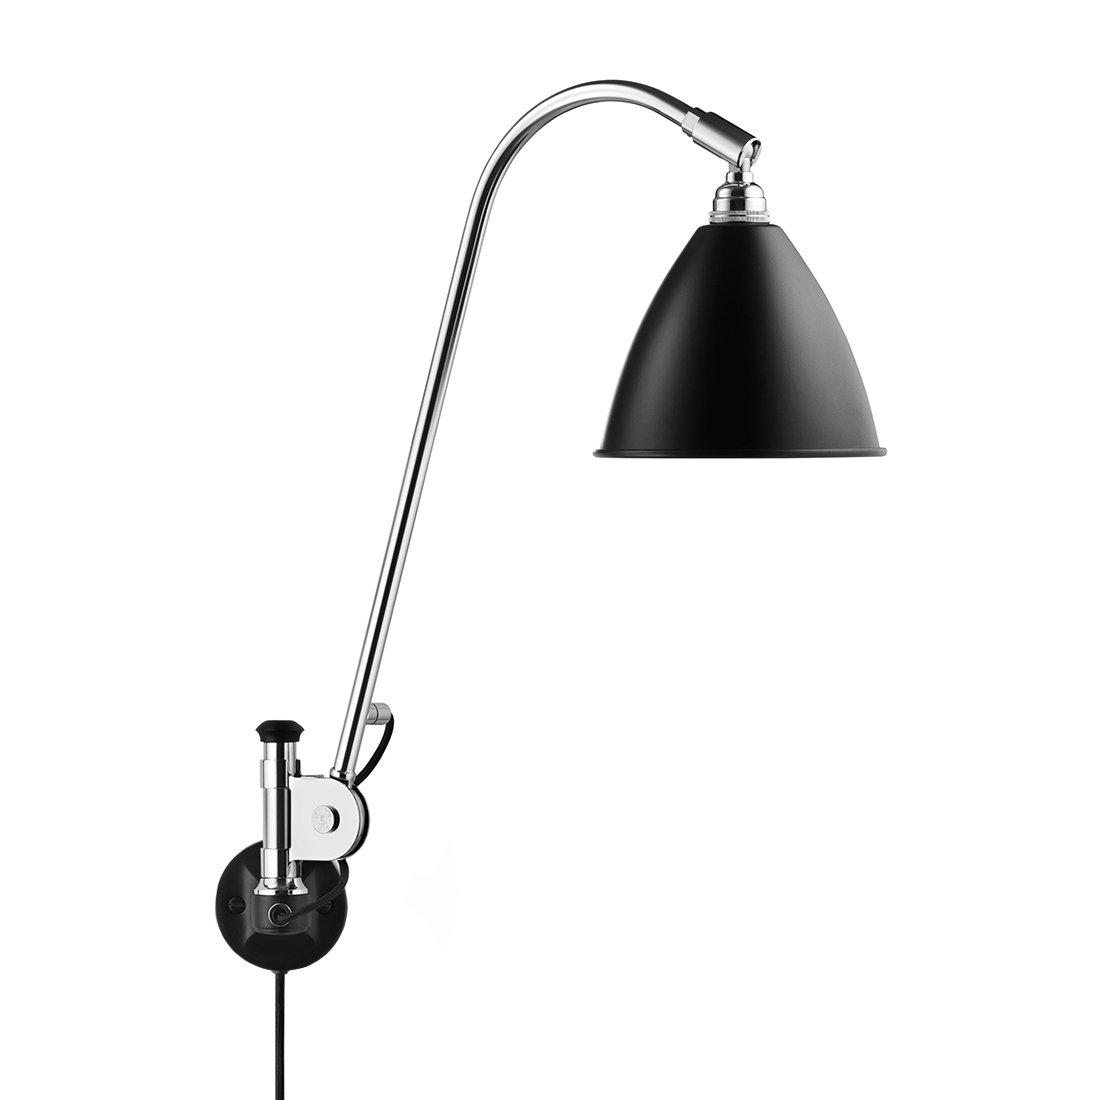 Gubi Bestlite BL6 Wandlamp